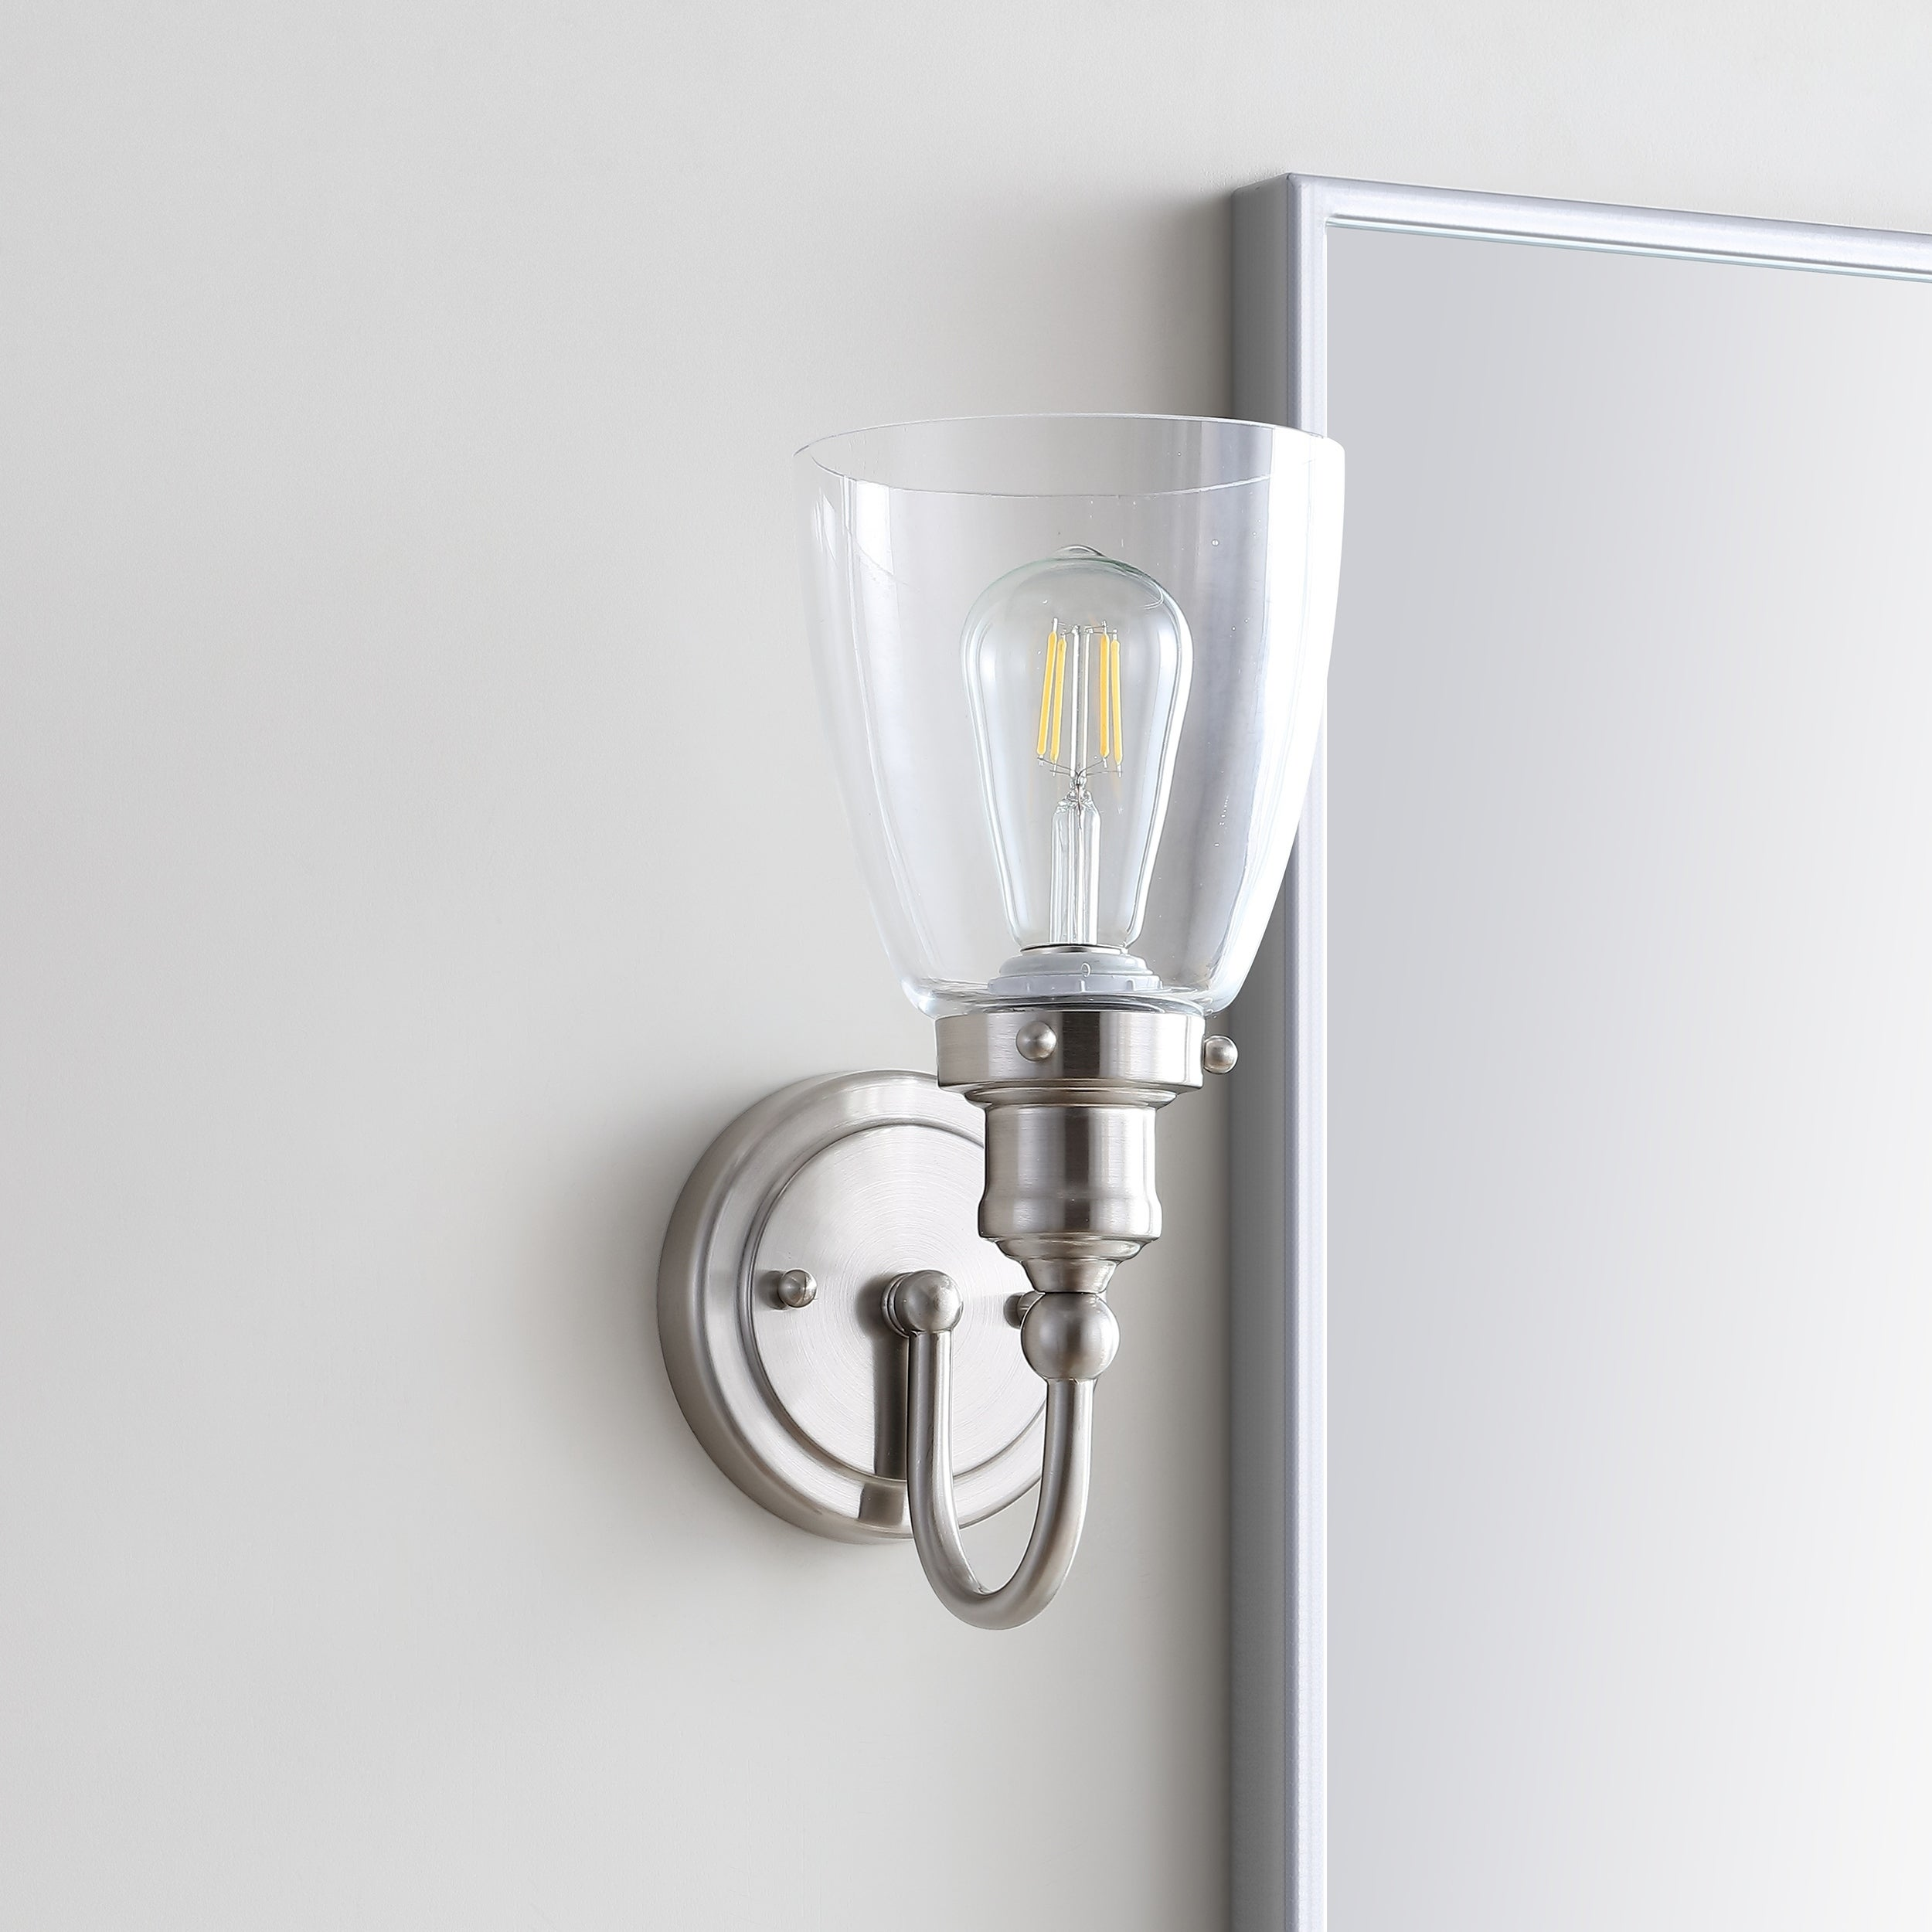 Image of: Shop Safavieh Lighting Darren Led Bathroom Sconce 5 3 X6 8 X11 8 On Sale Overstock 28165077